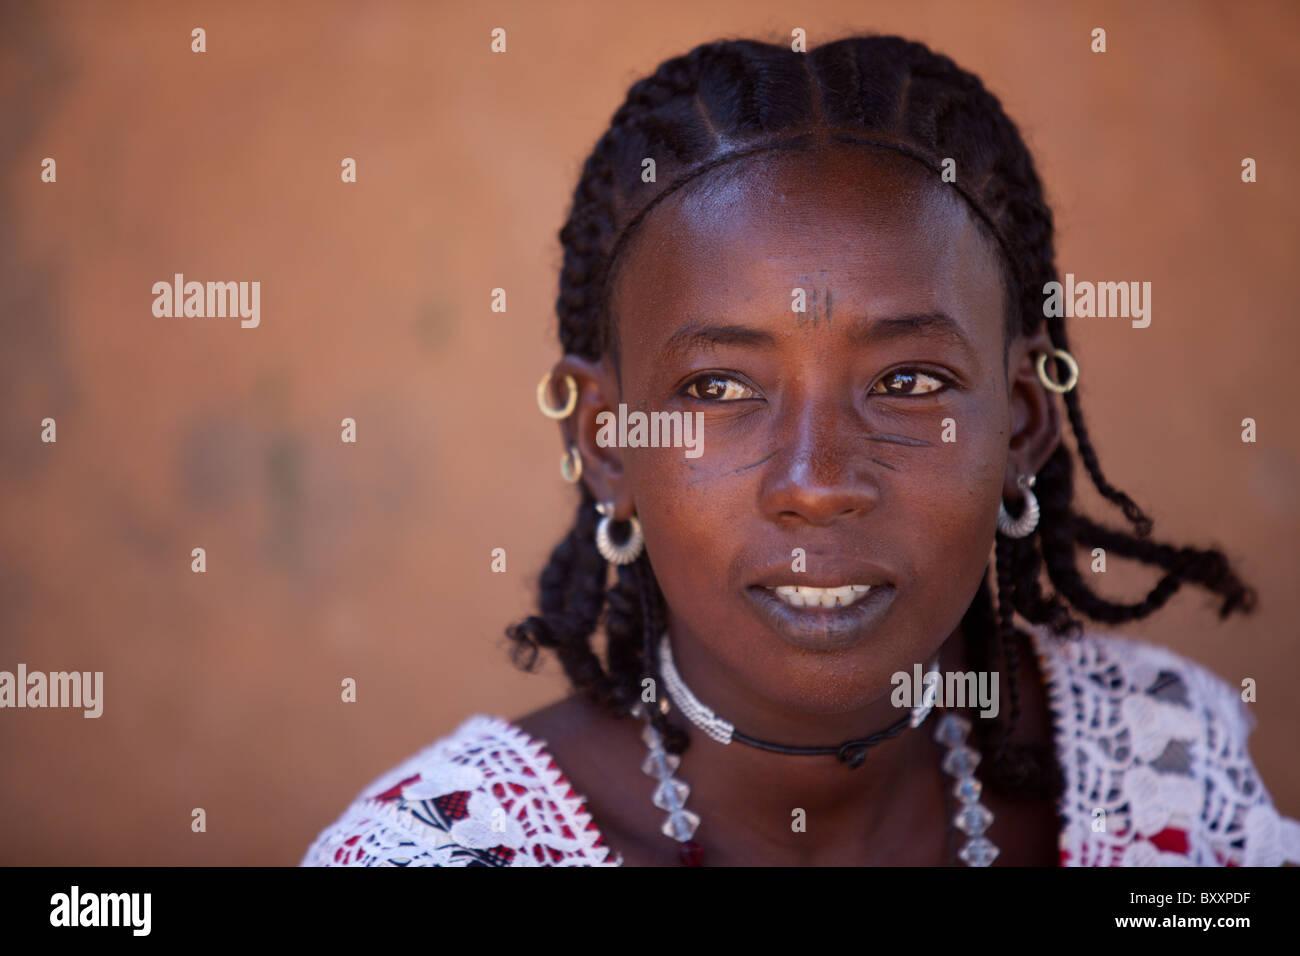 Fulbe-Frau in Djibo im nördlichen Burkina Faso. Die Frau Sport der traditionellen Gesichts Narbenbildung, gilt Stockbild